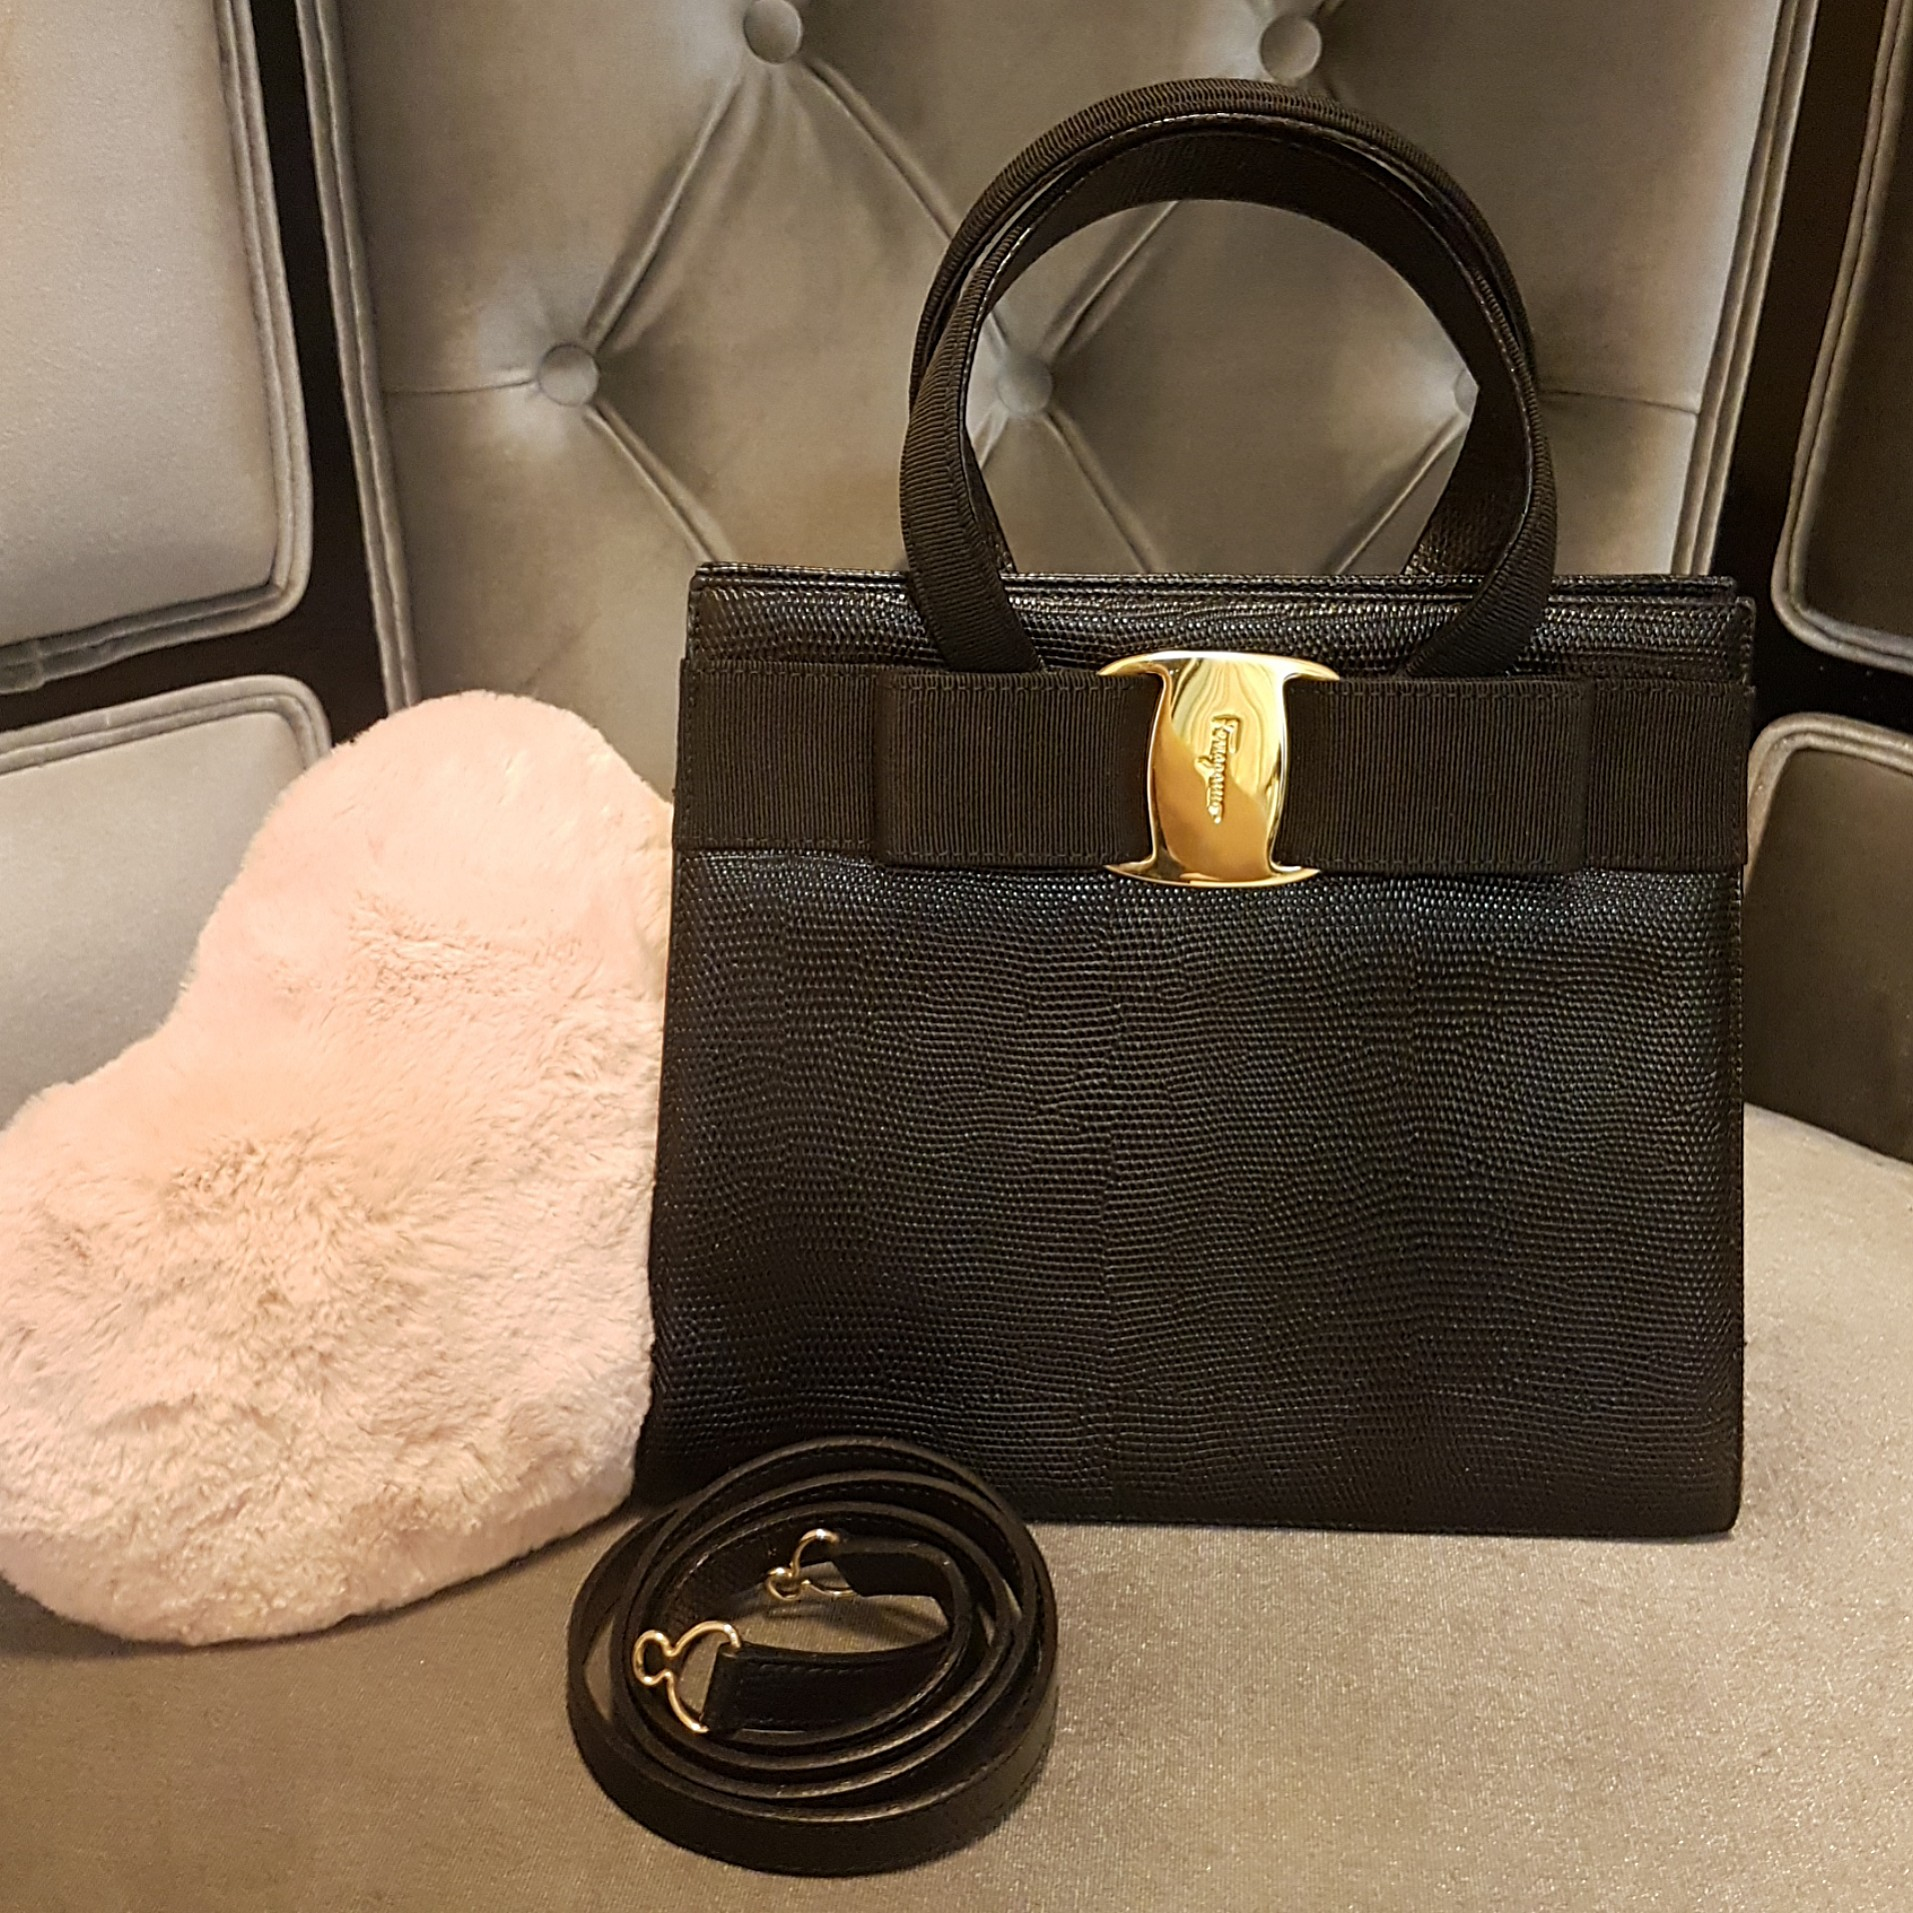 ebc09ac3bd2c Ferragamo (Lizard-leather) Vintage Vara Bow 2-Way Handbag (Like-New  Condition)